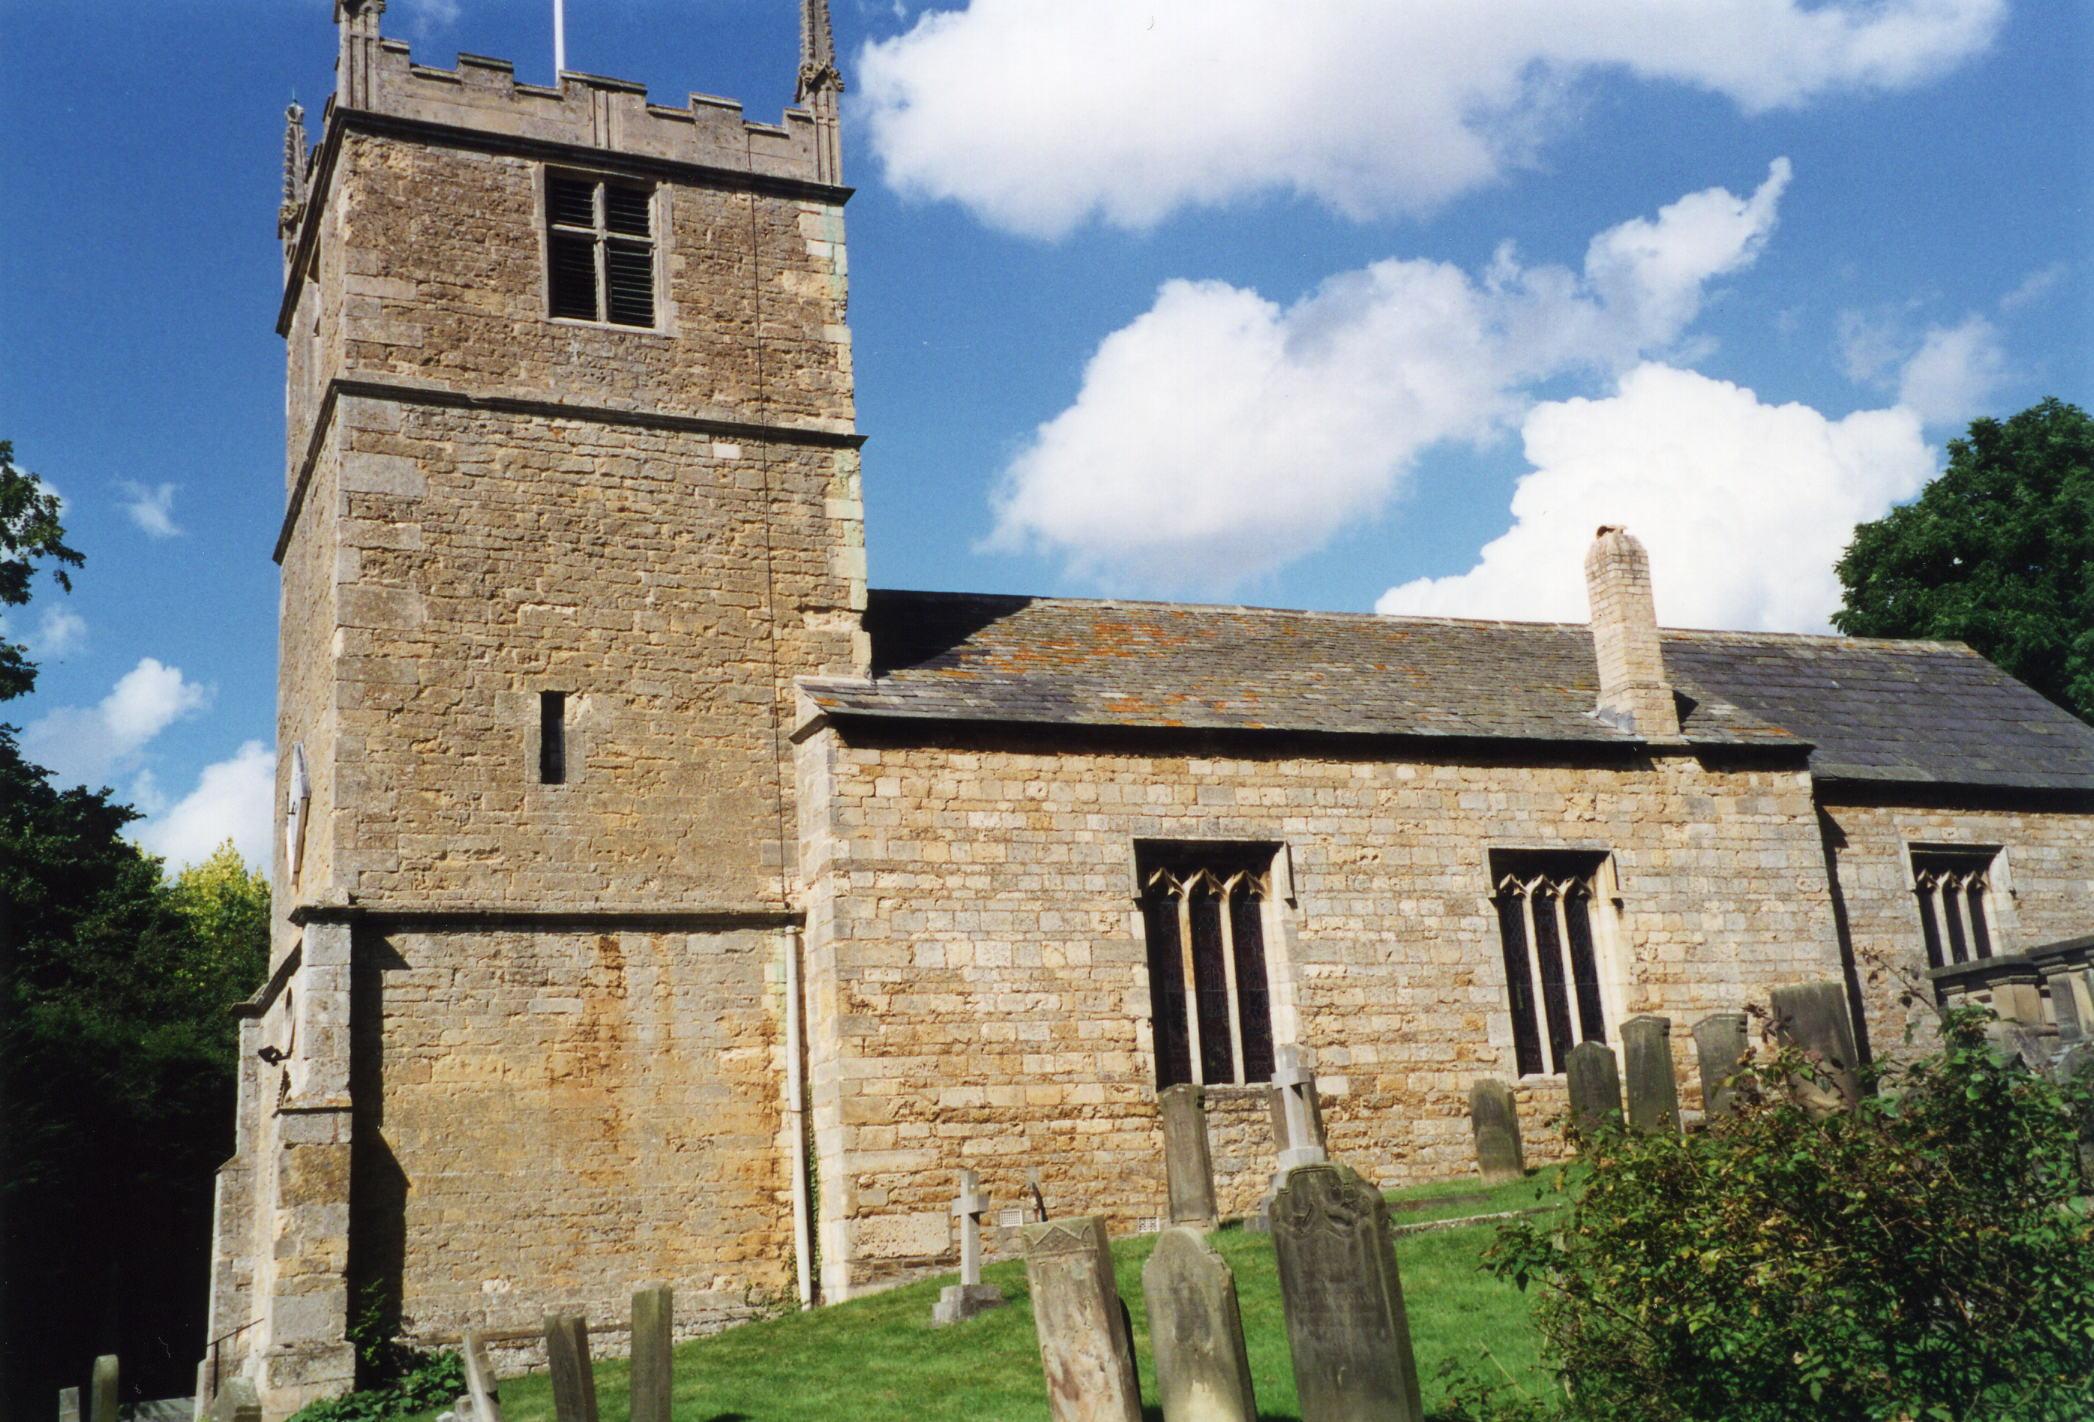 Burton St. Vincent parish church